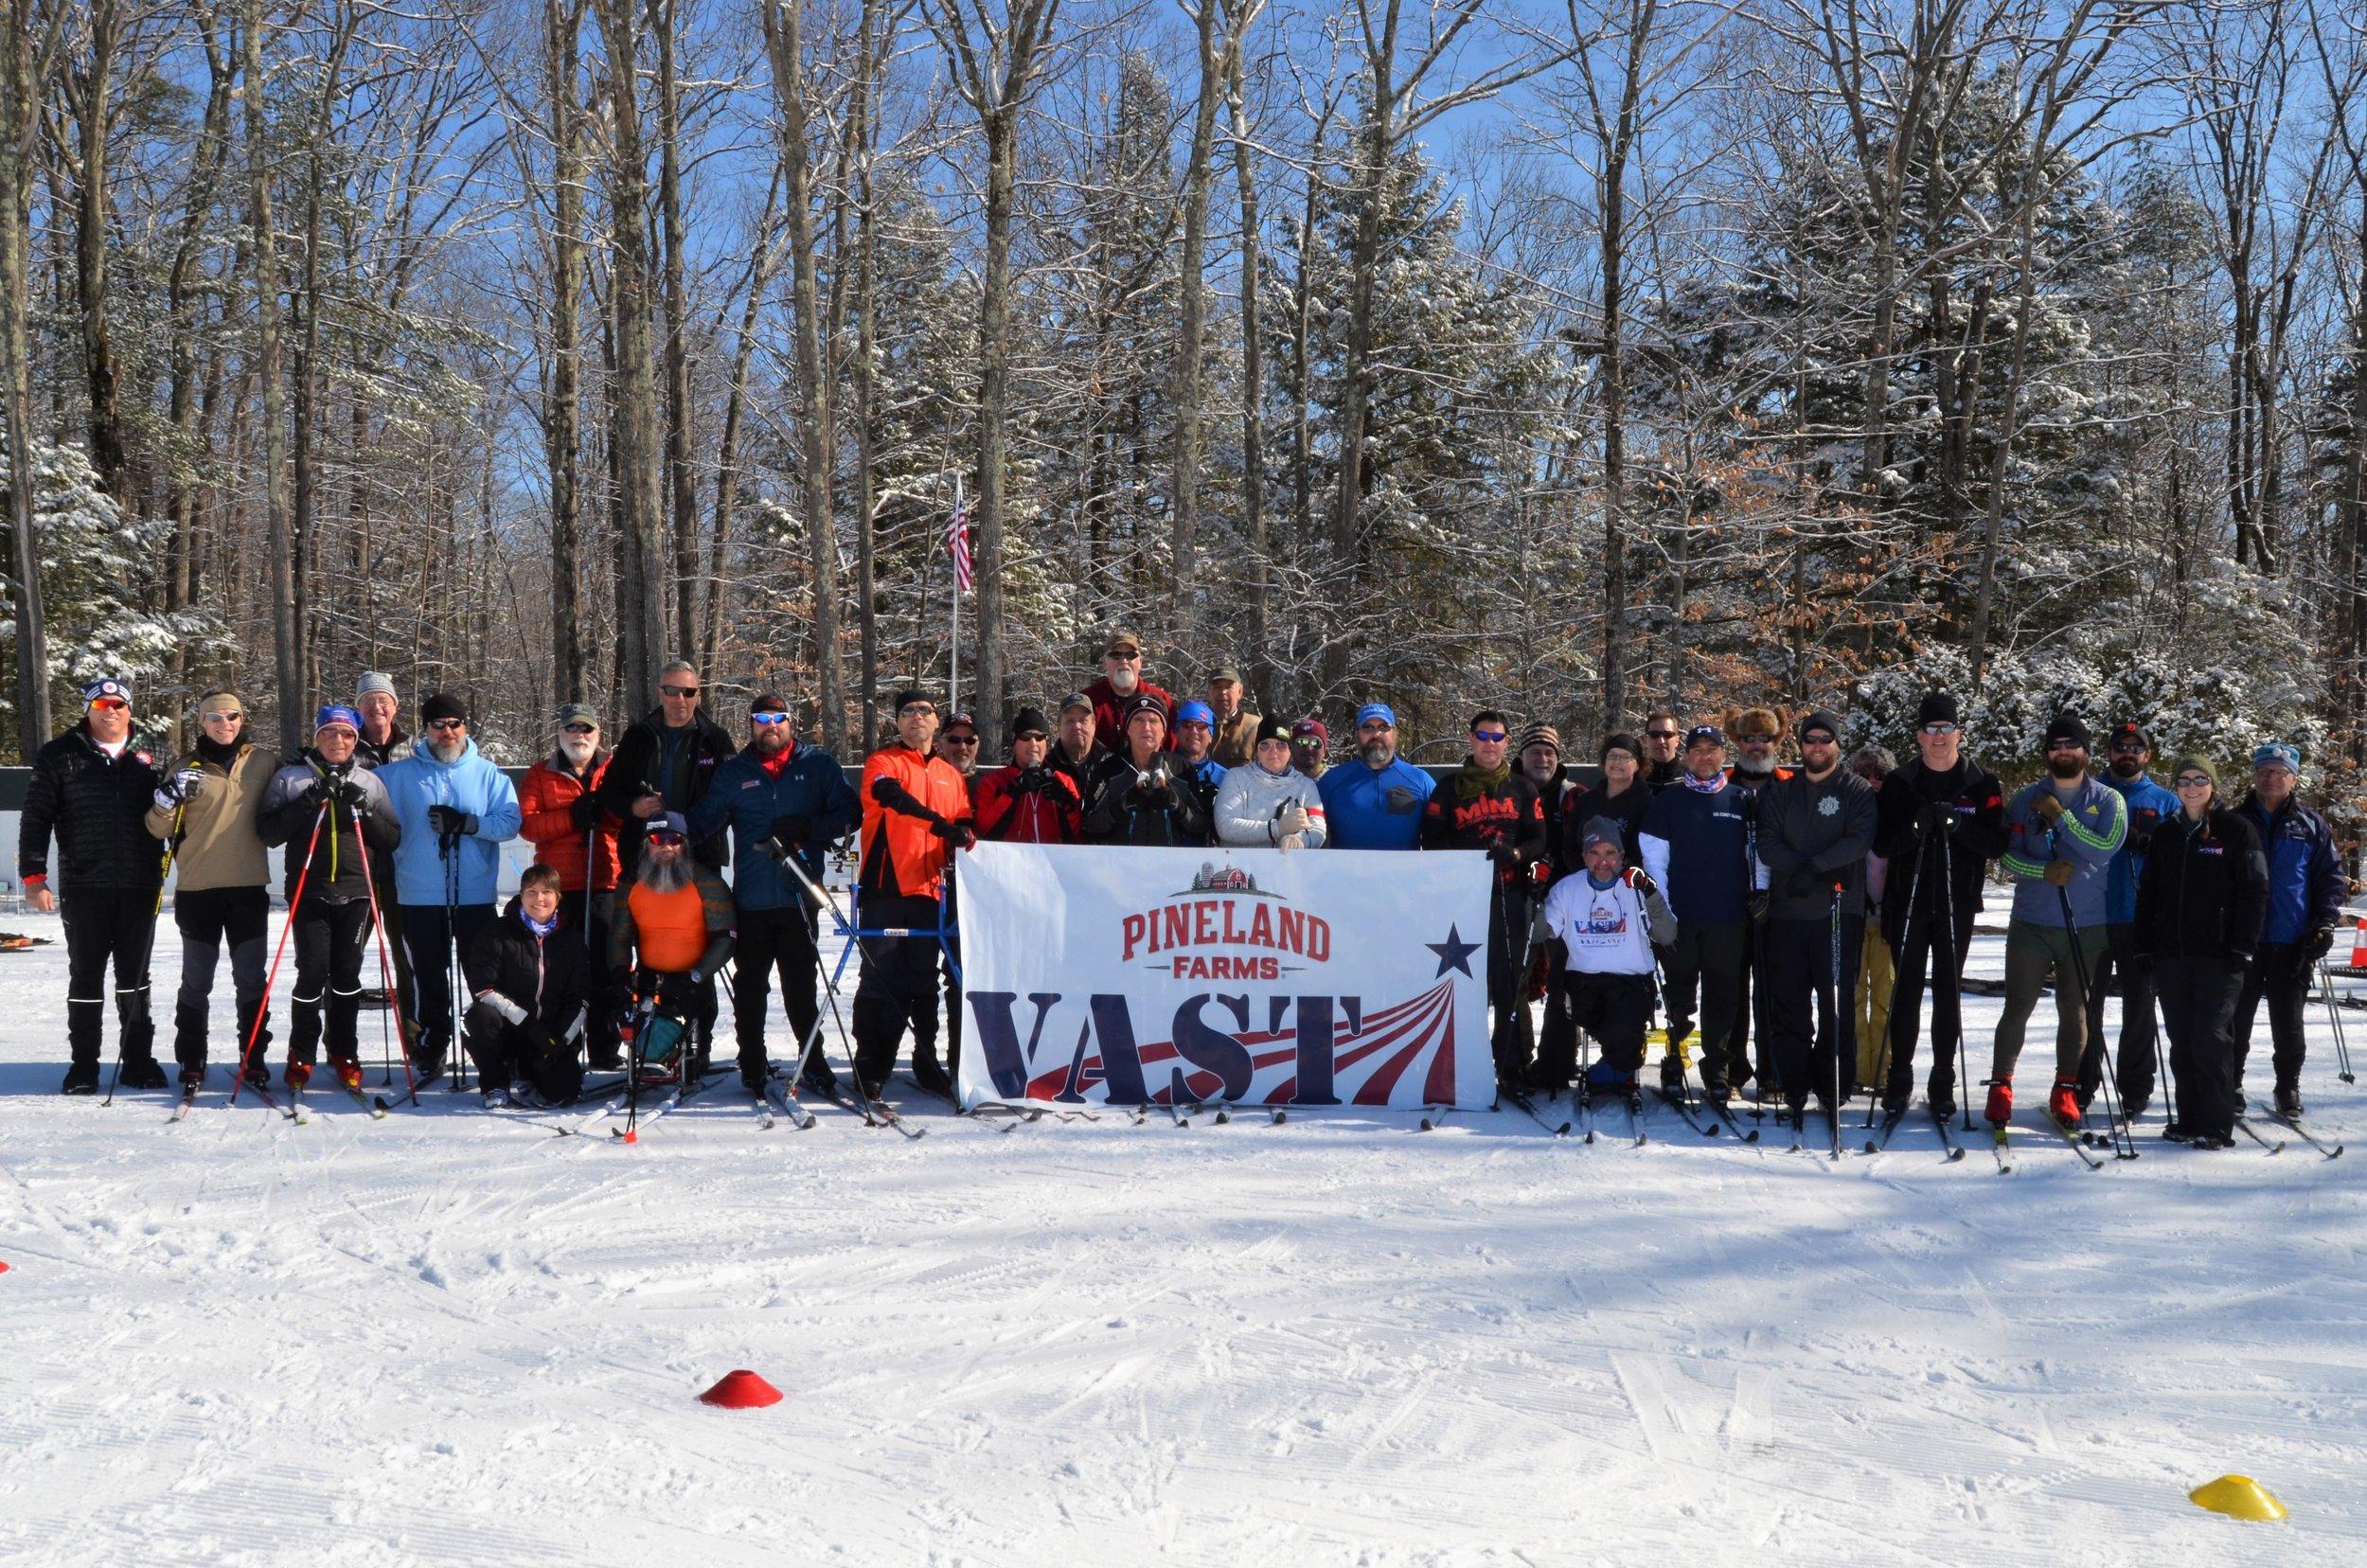 VAST Biathlon Camp at Pineland Farms